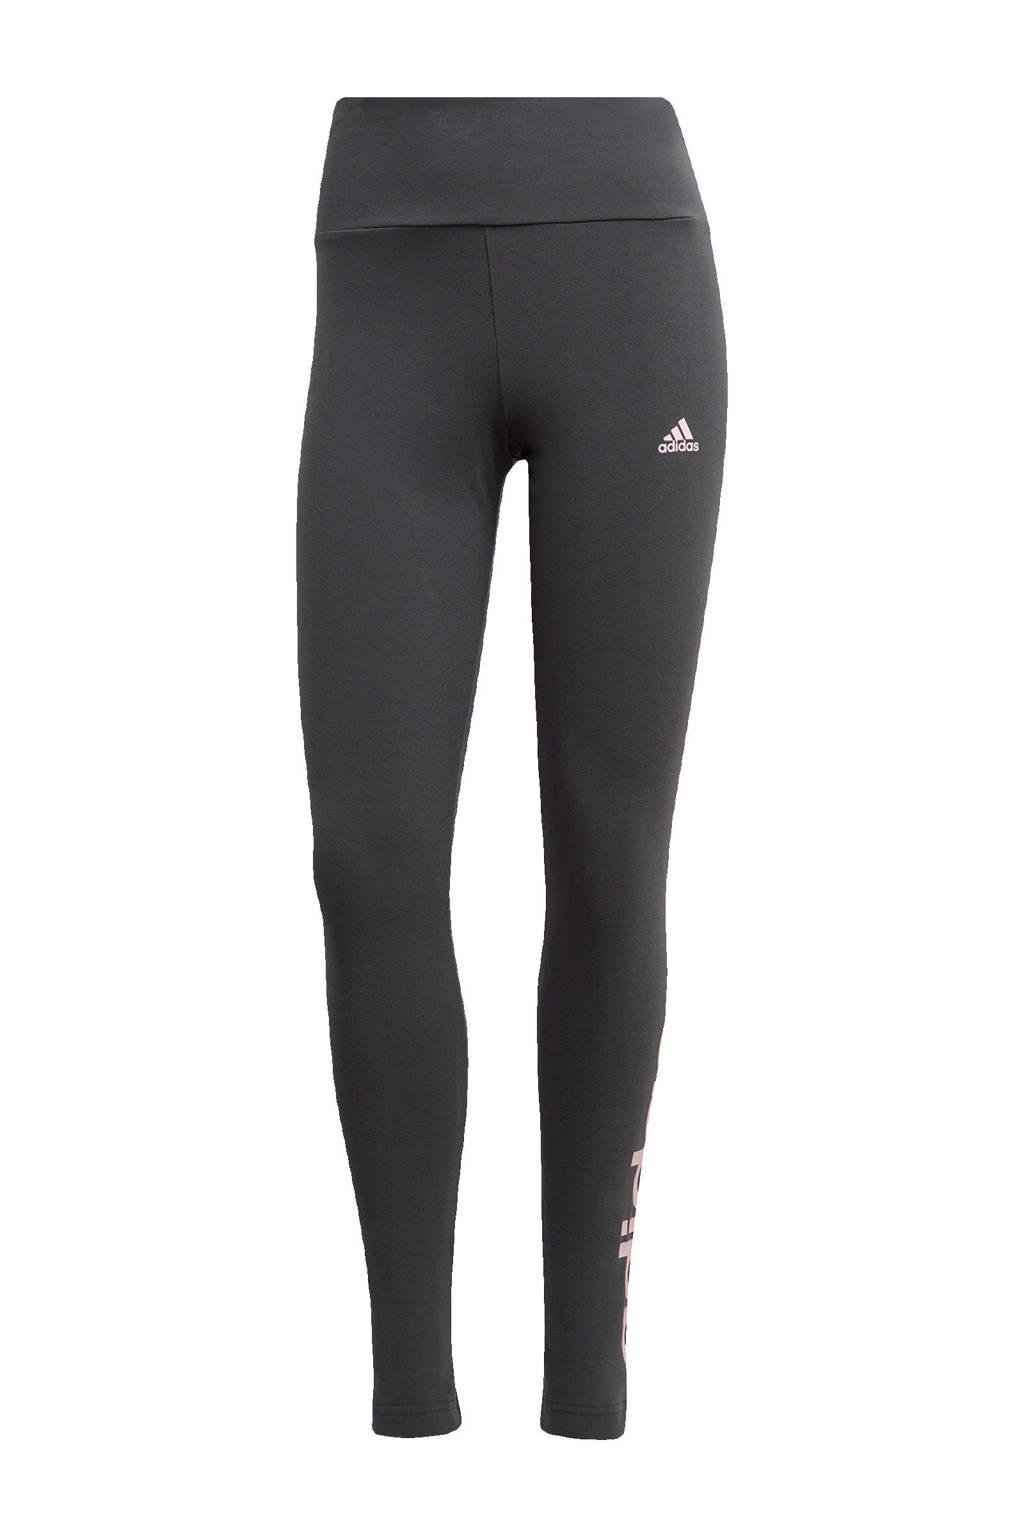 adidas Performance sportlegging grijs/roze, Grijs/roze